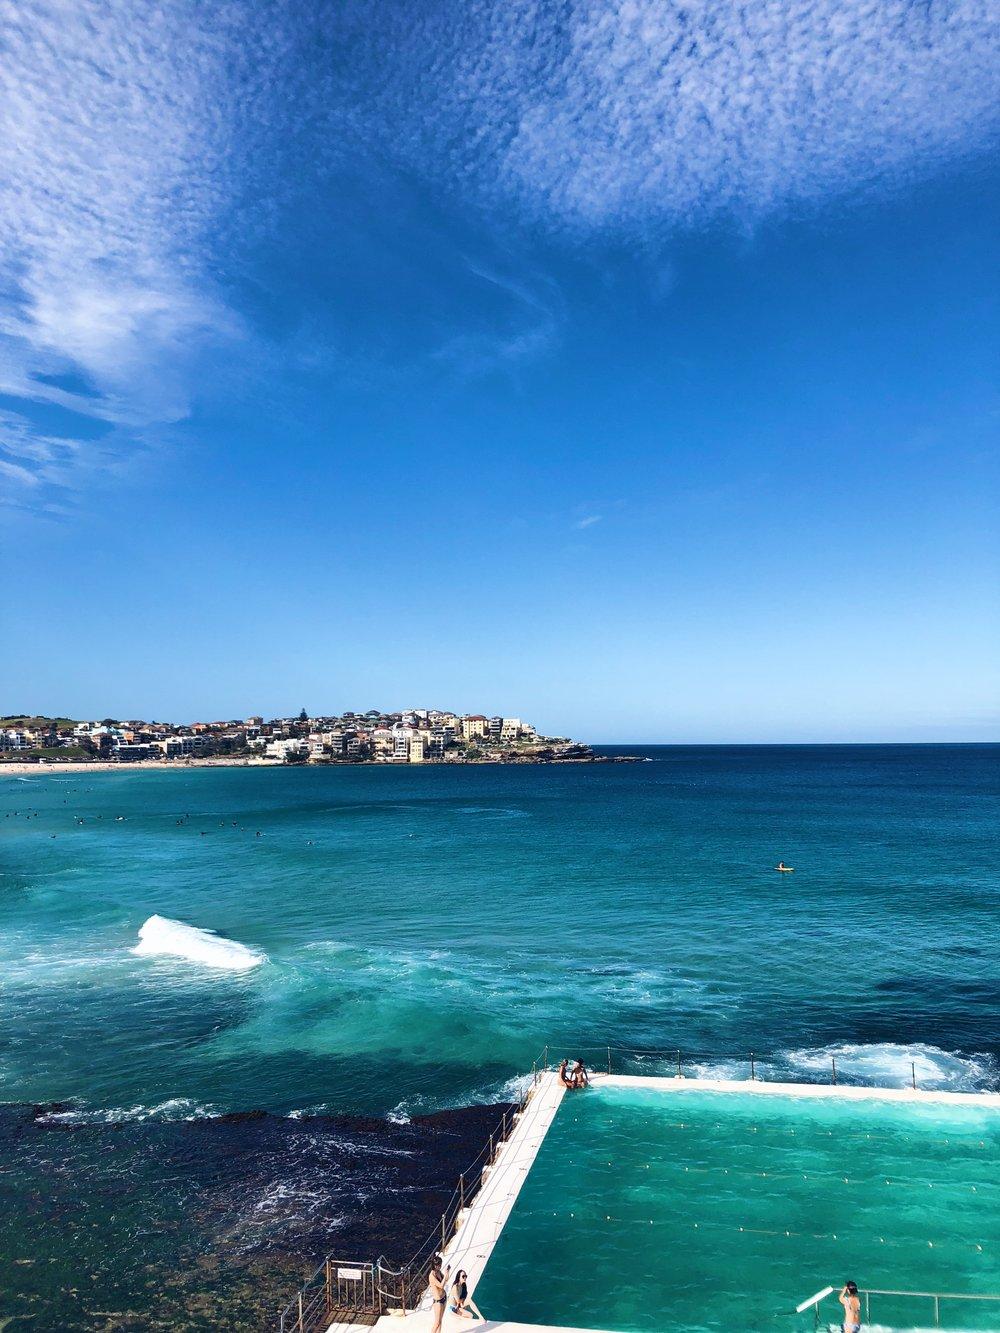 - Bondi to Coogee coastal walk in Sydney